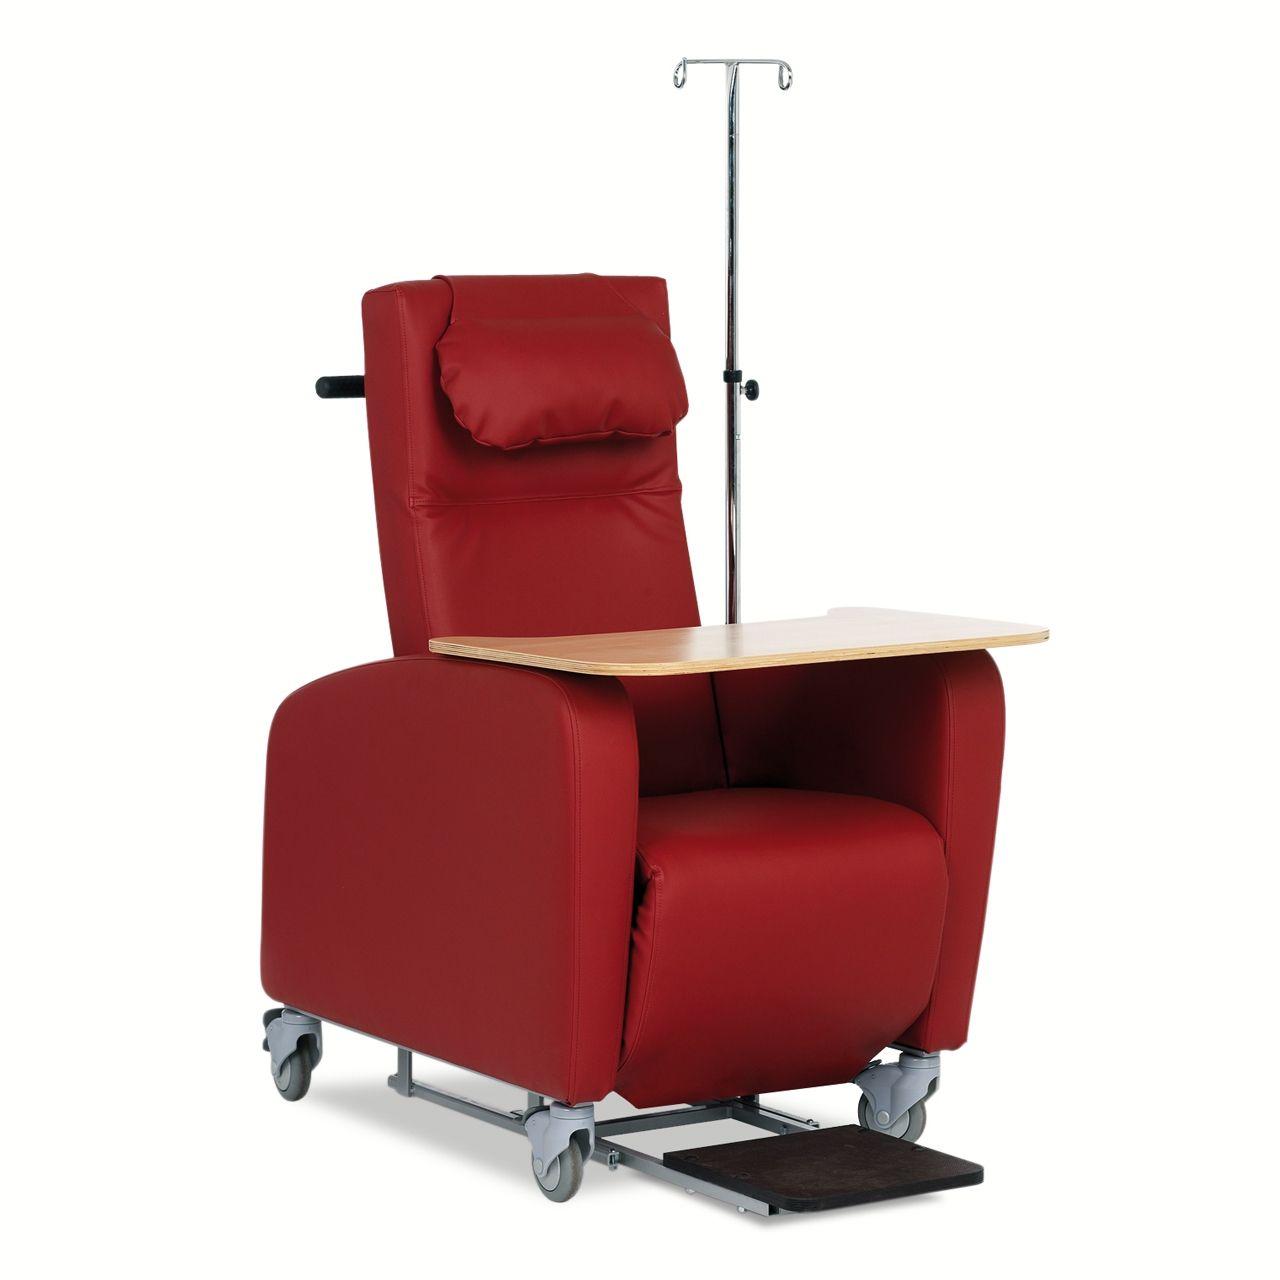 Comfort senior 2 stoel zorg ARTNRNNB 0000s 0002 Schuin